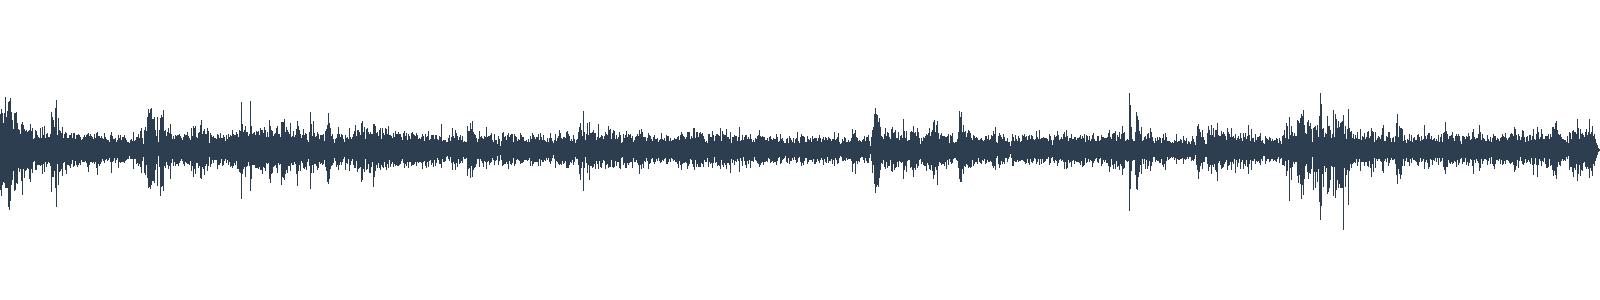 #2 Speciál o zvukovém Sherlocku Holmesovi waveform